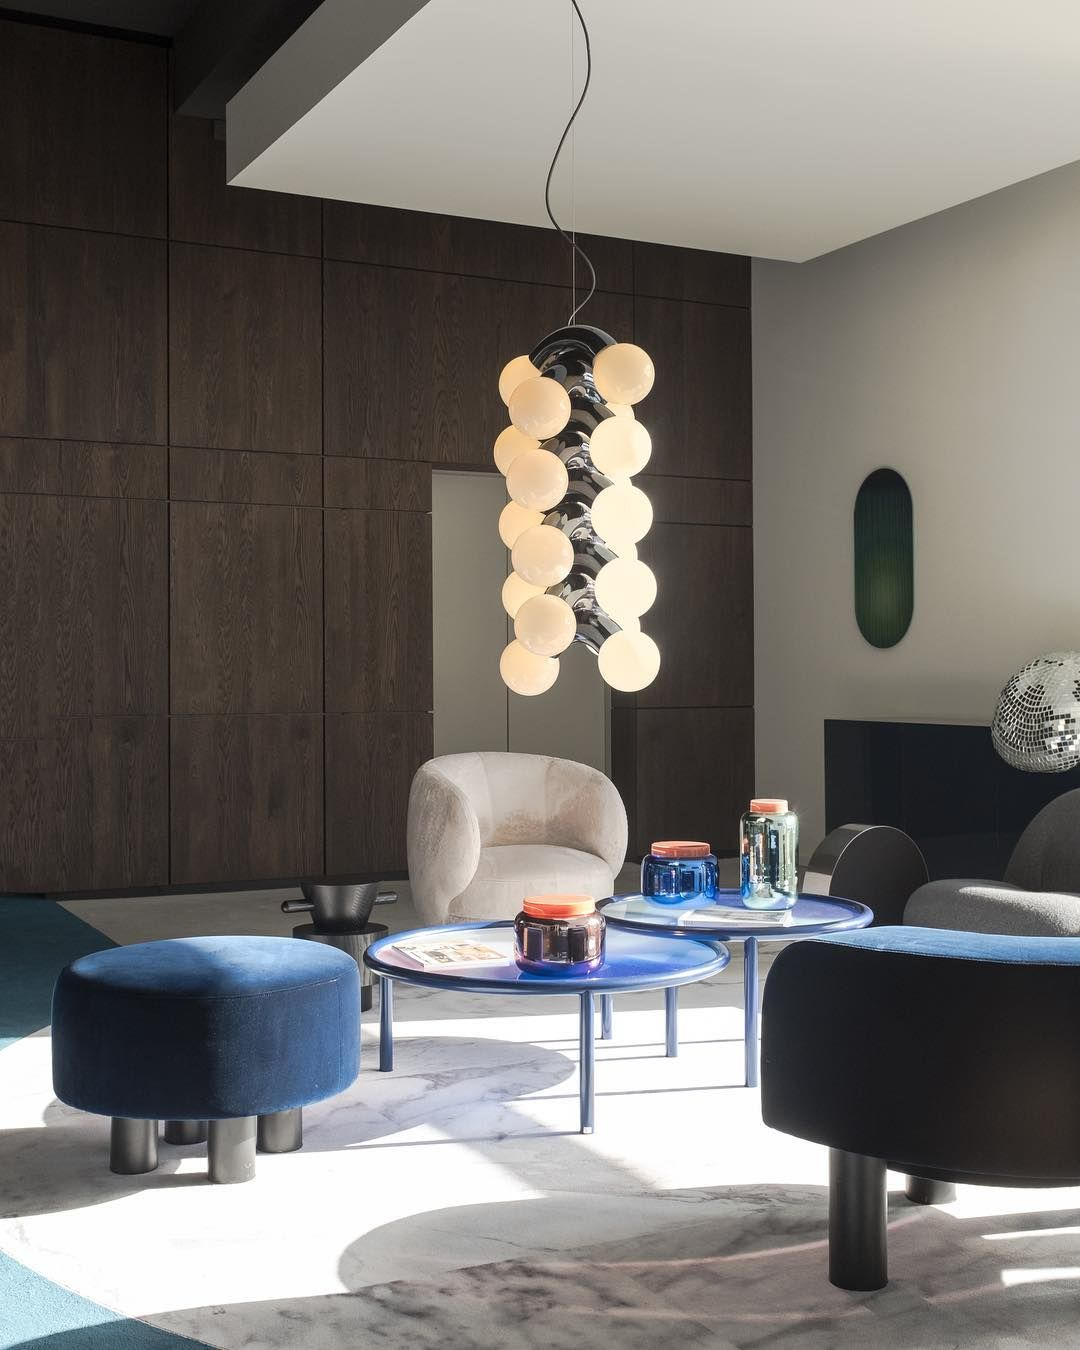 Home Interiorlighting Design: Vine Pendant Light, Multiple Low Wattage LED Lamps